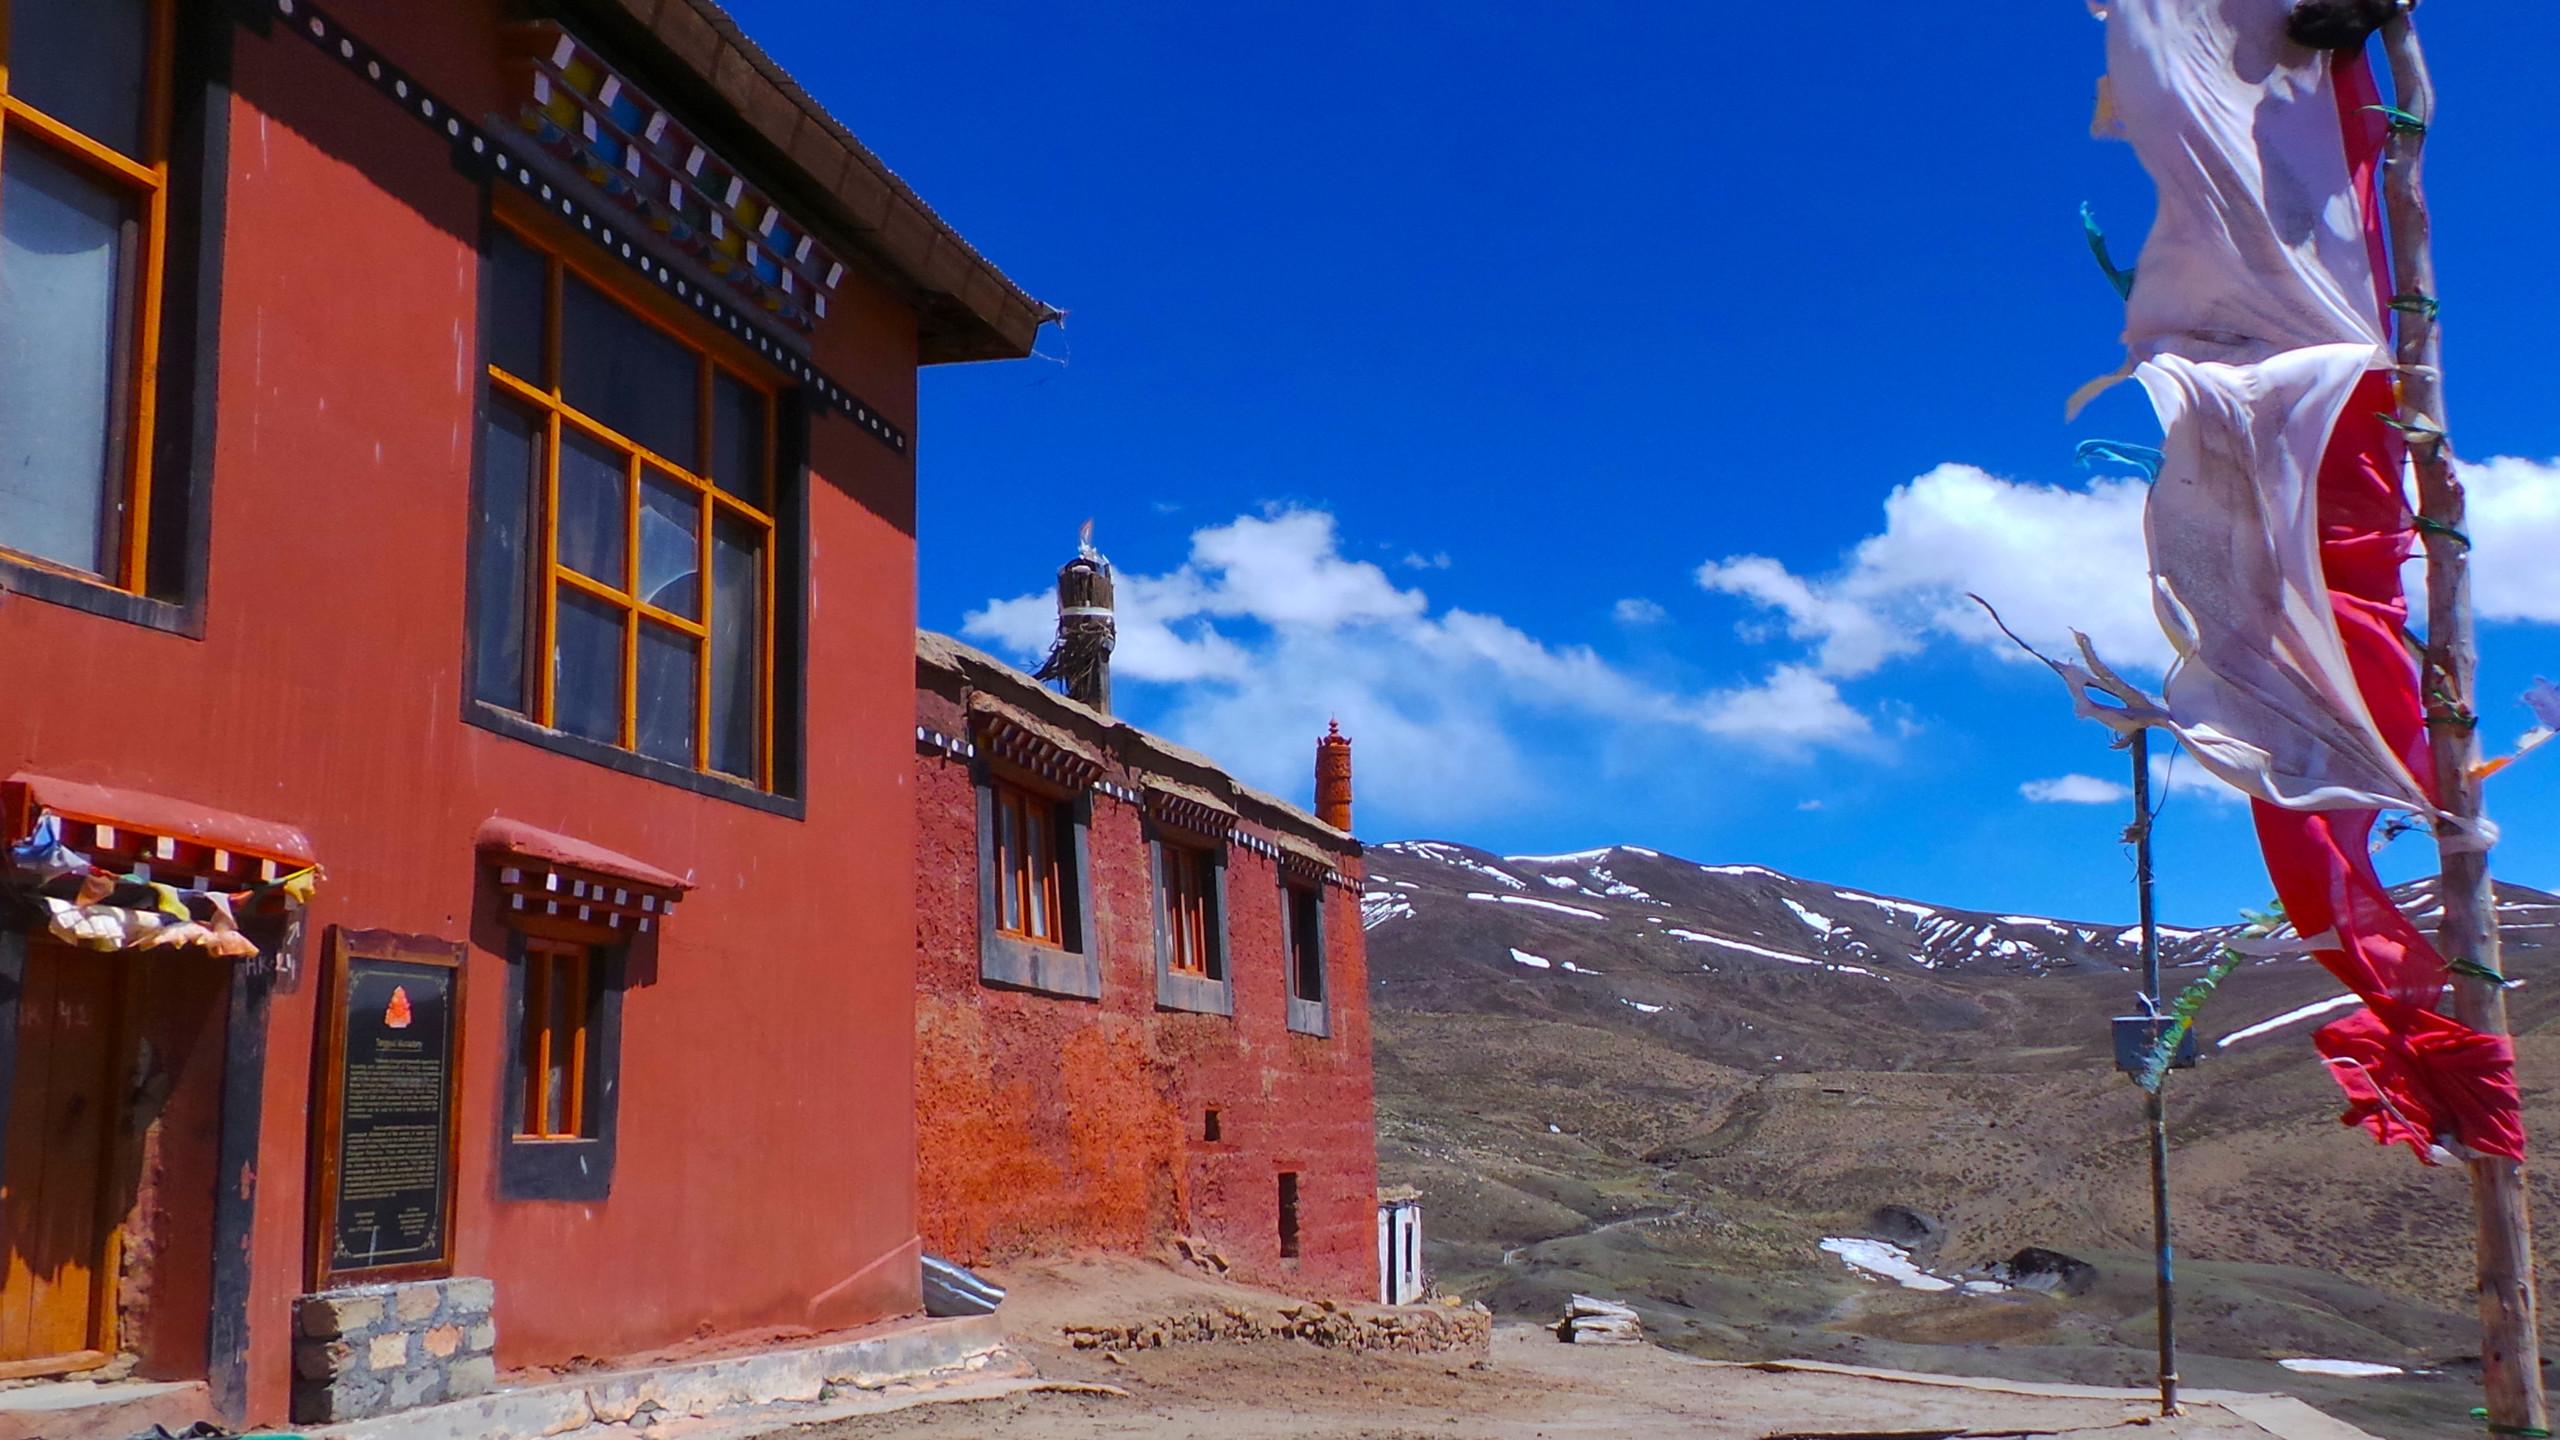 Komik Village, Spiti Valley, Himalayas, India